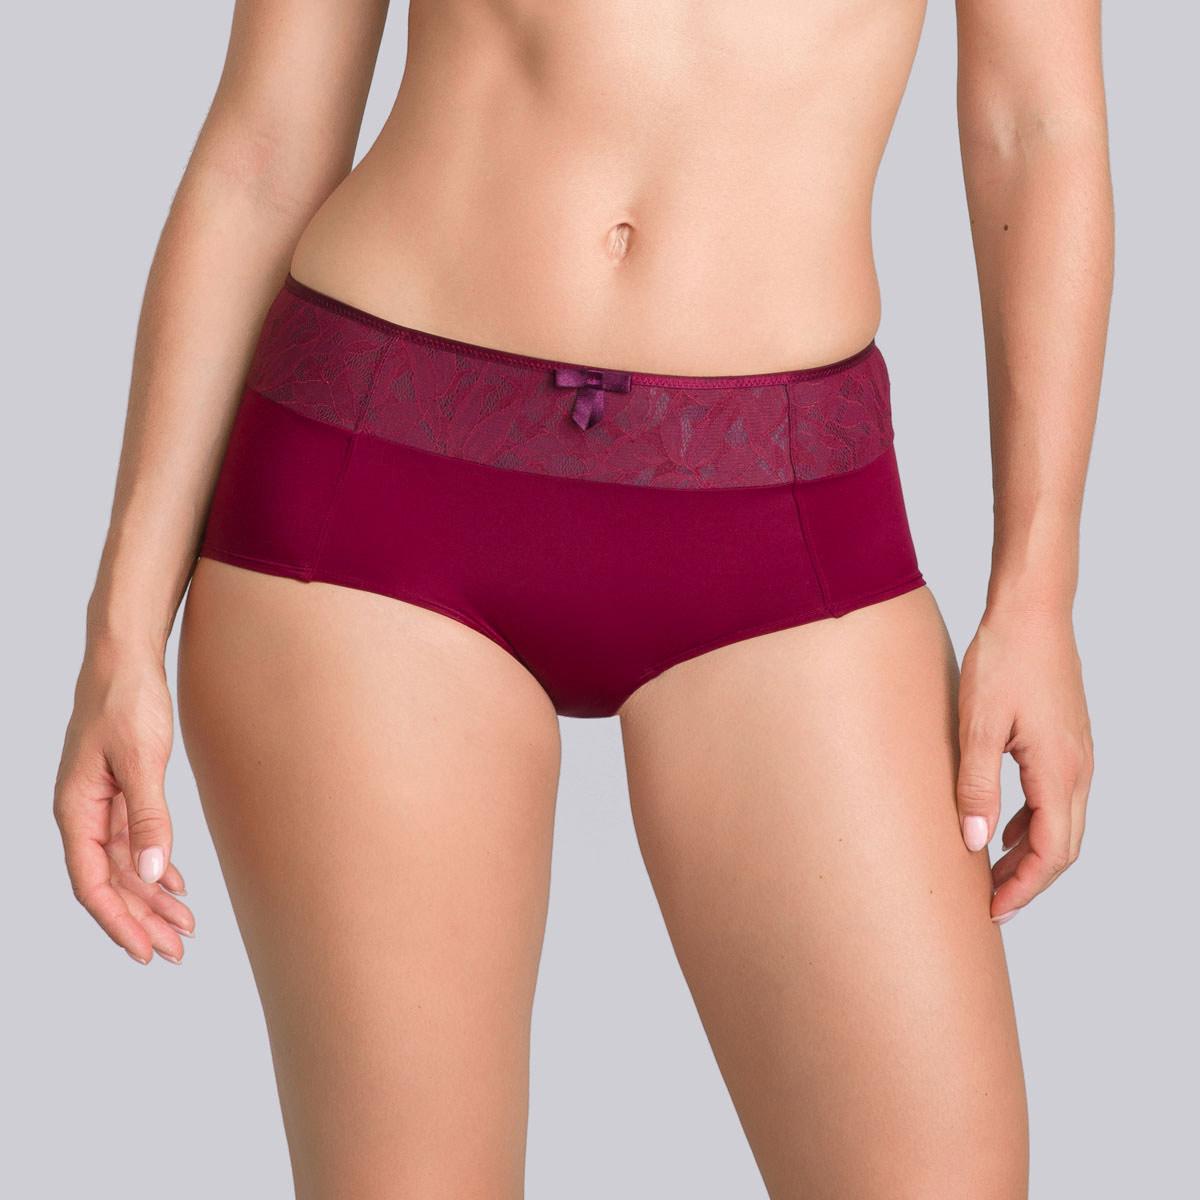 Burgundy grey boy shorts - Ideal Beauty Lace-PLAYTEX